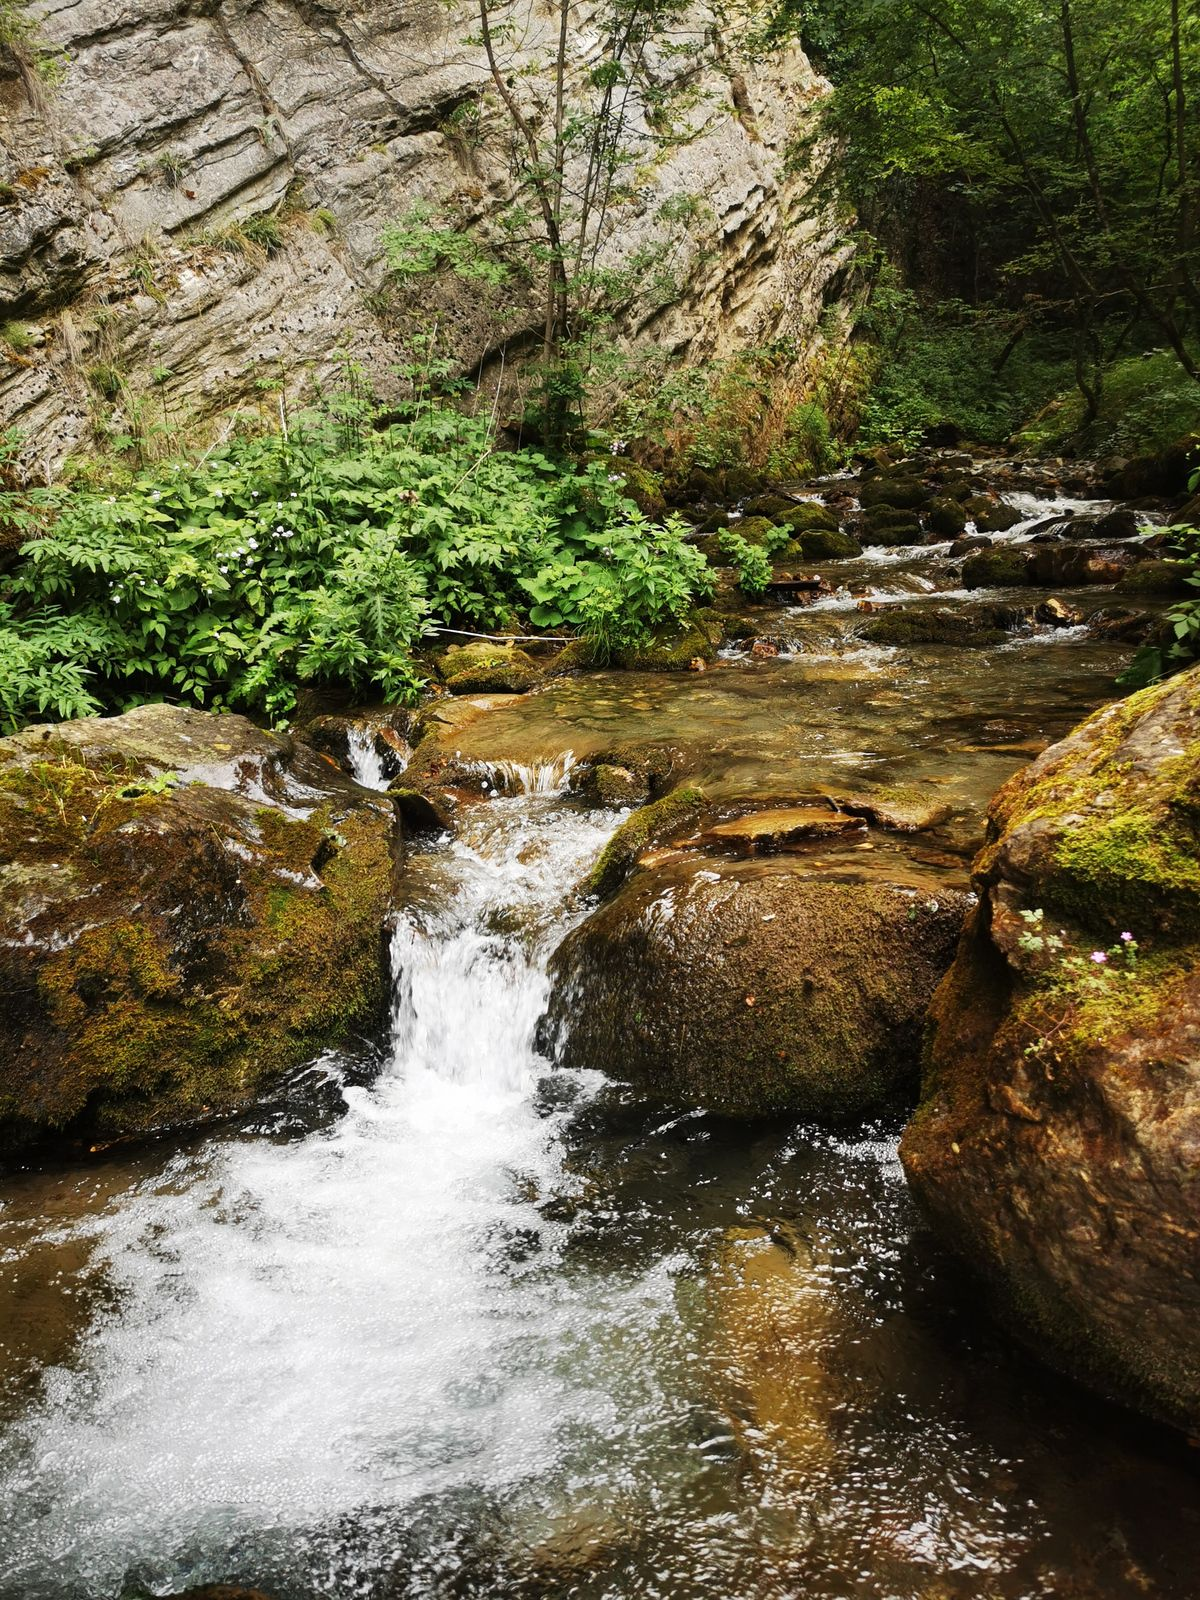 Lundi 26 juillet : monastère Saint-Jean Bigorski et Duf Waterfall